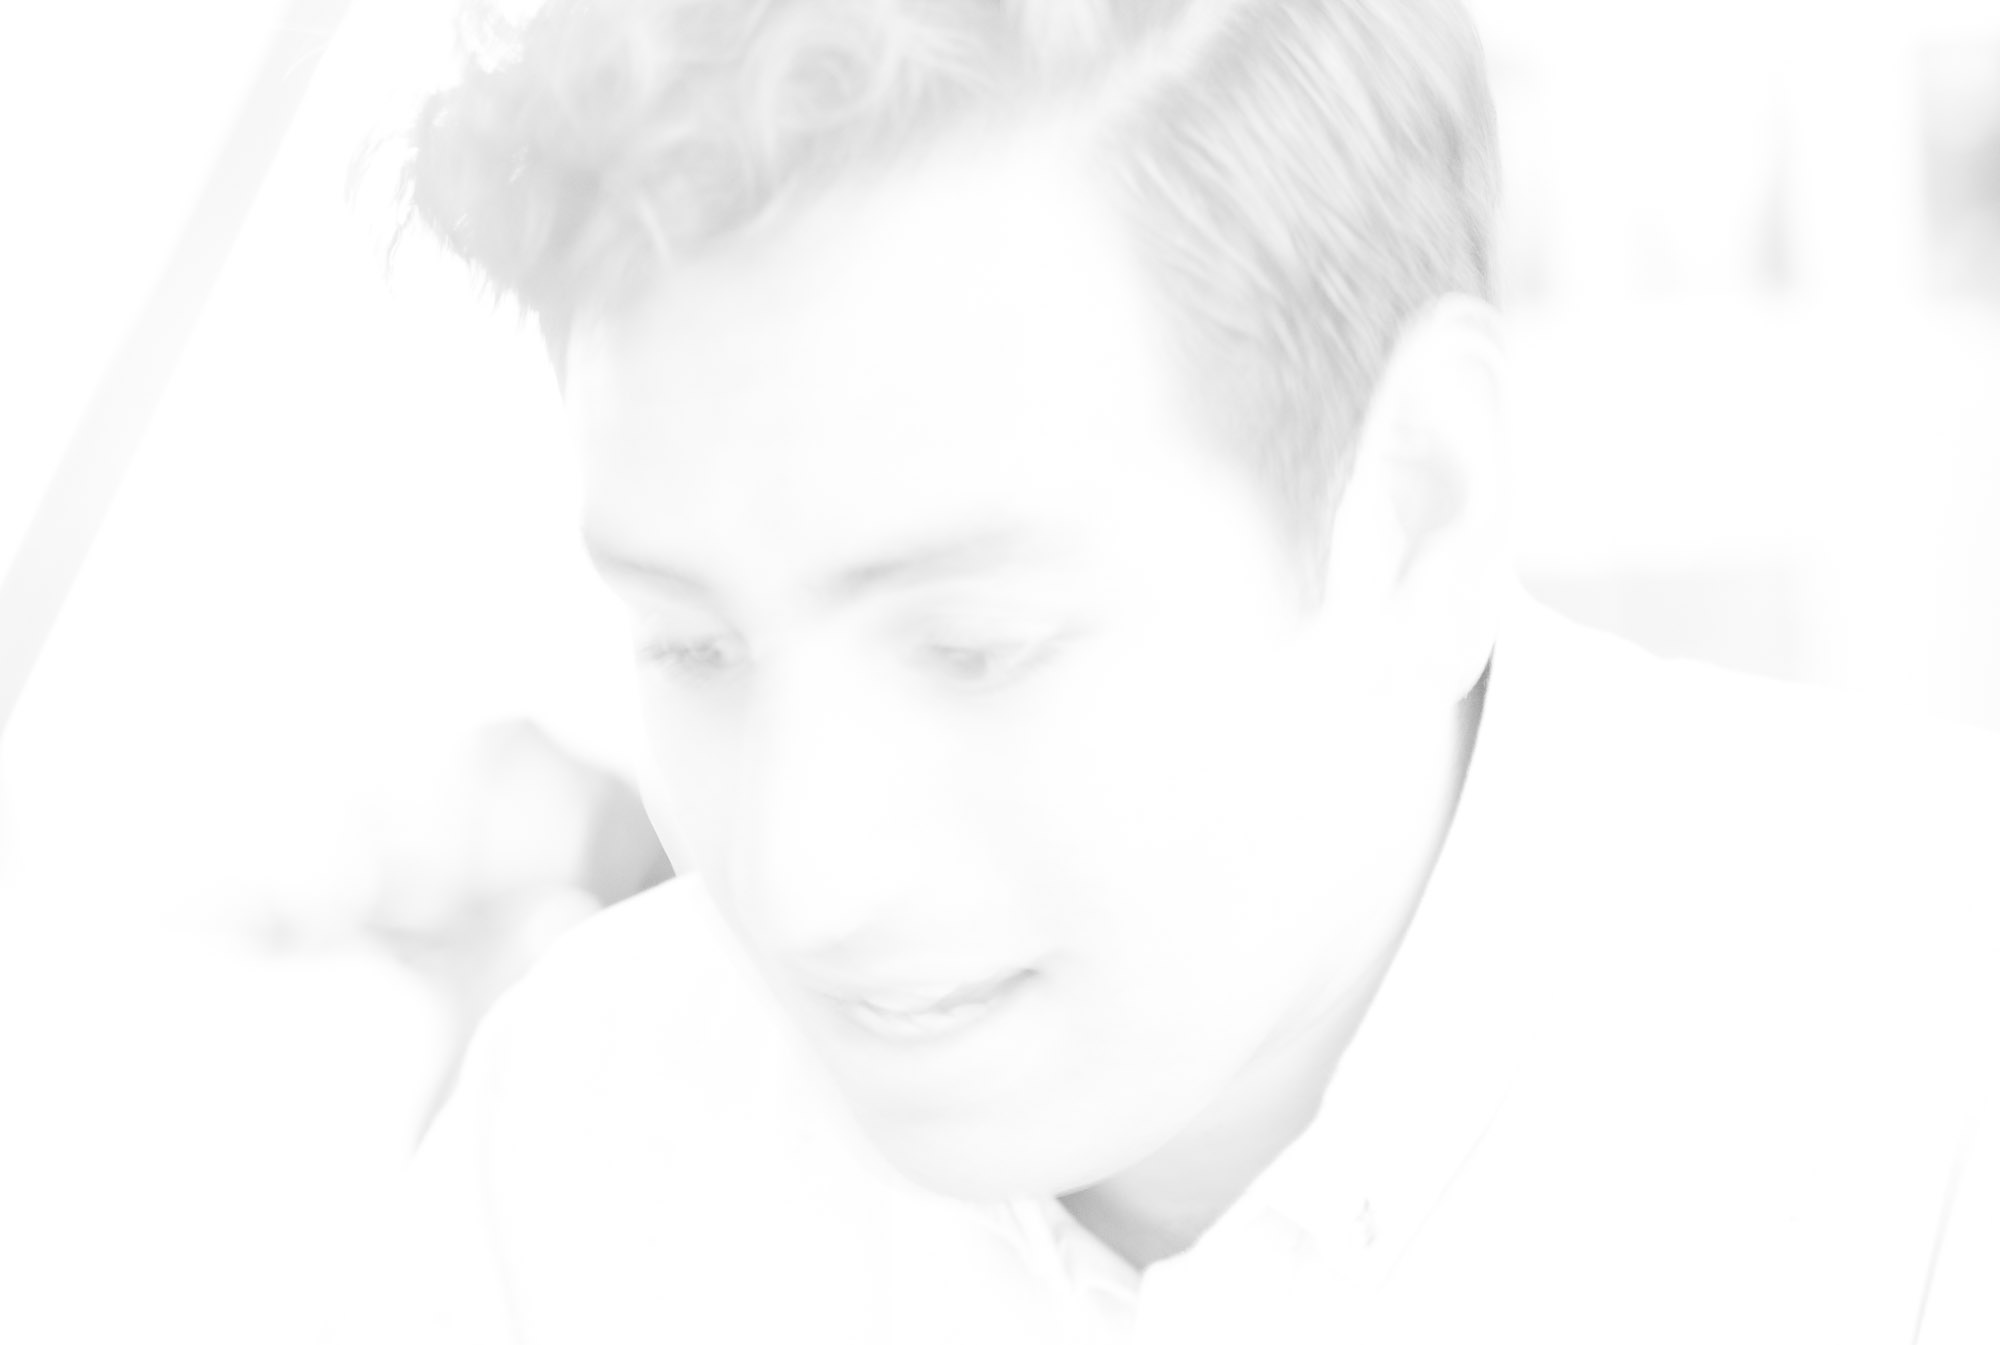 20140504_Hack2End_BW-67.jpg